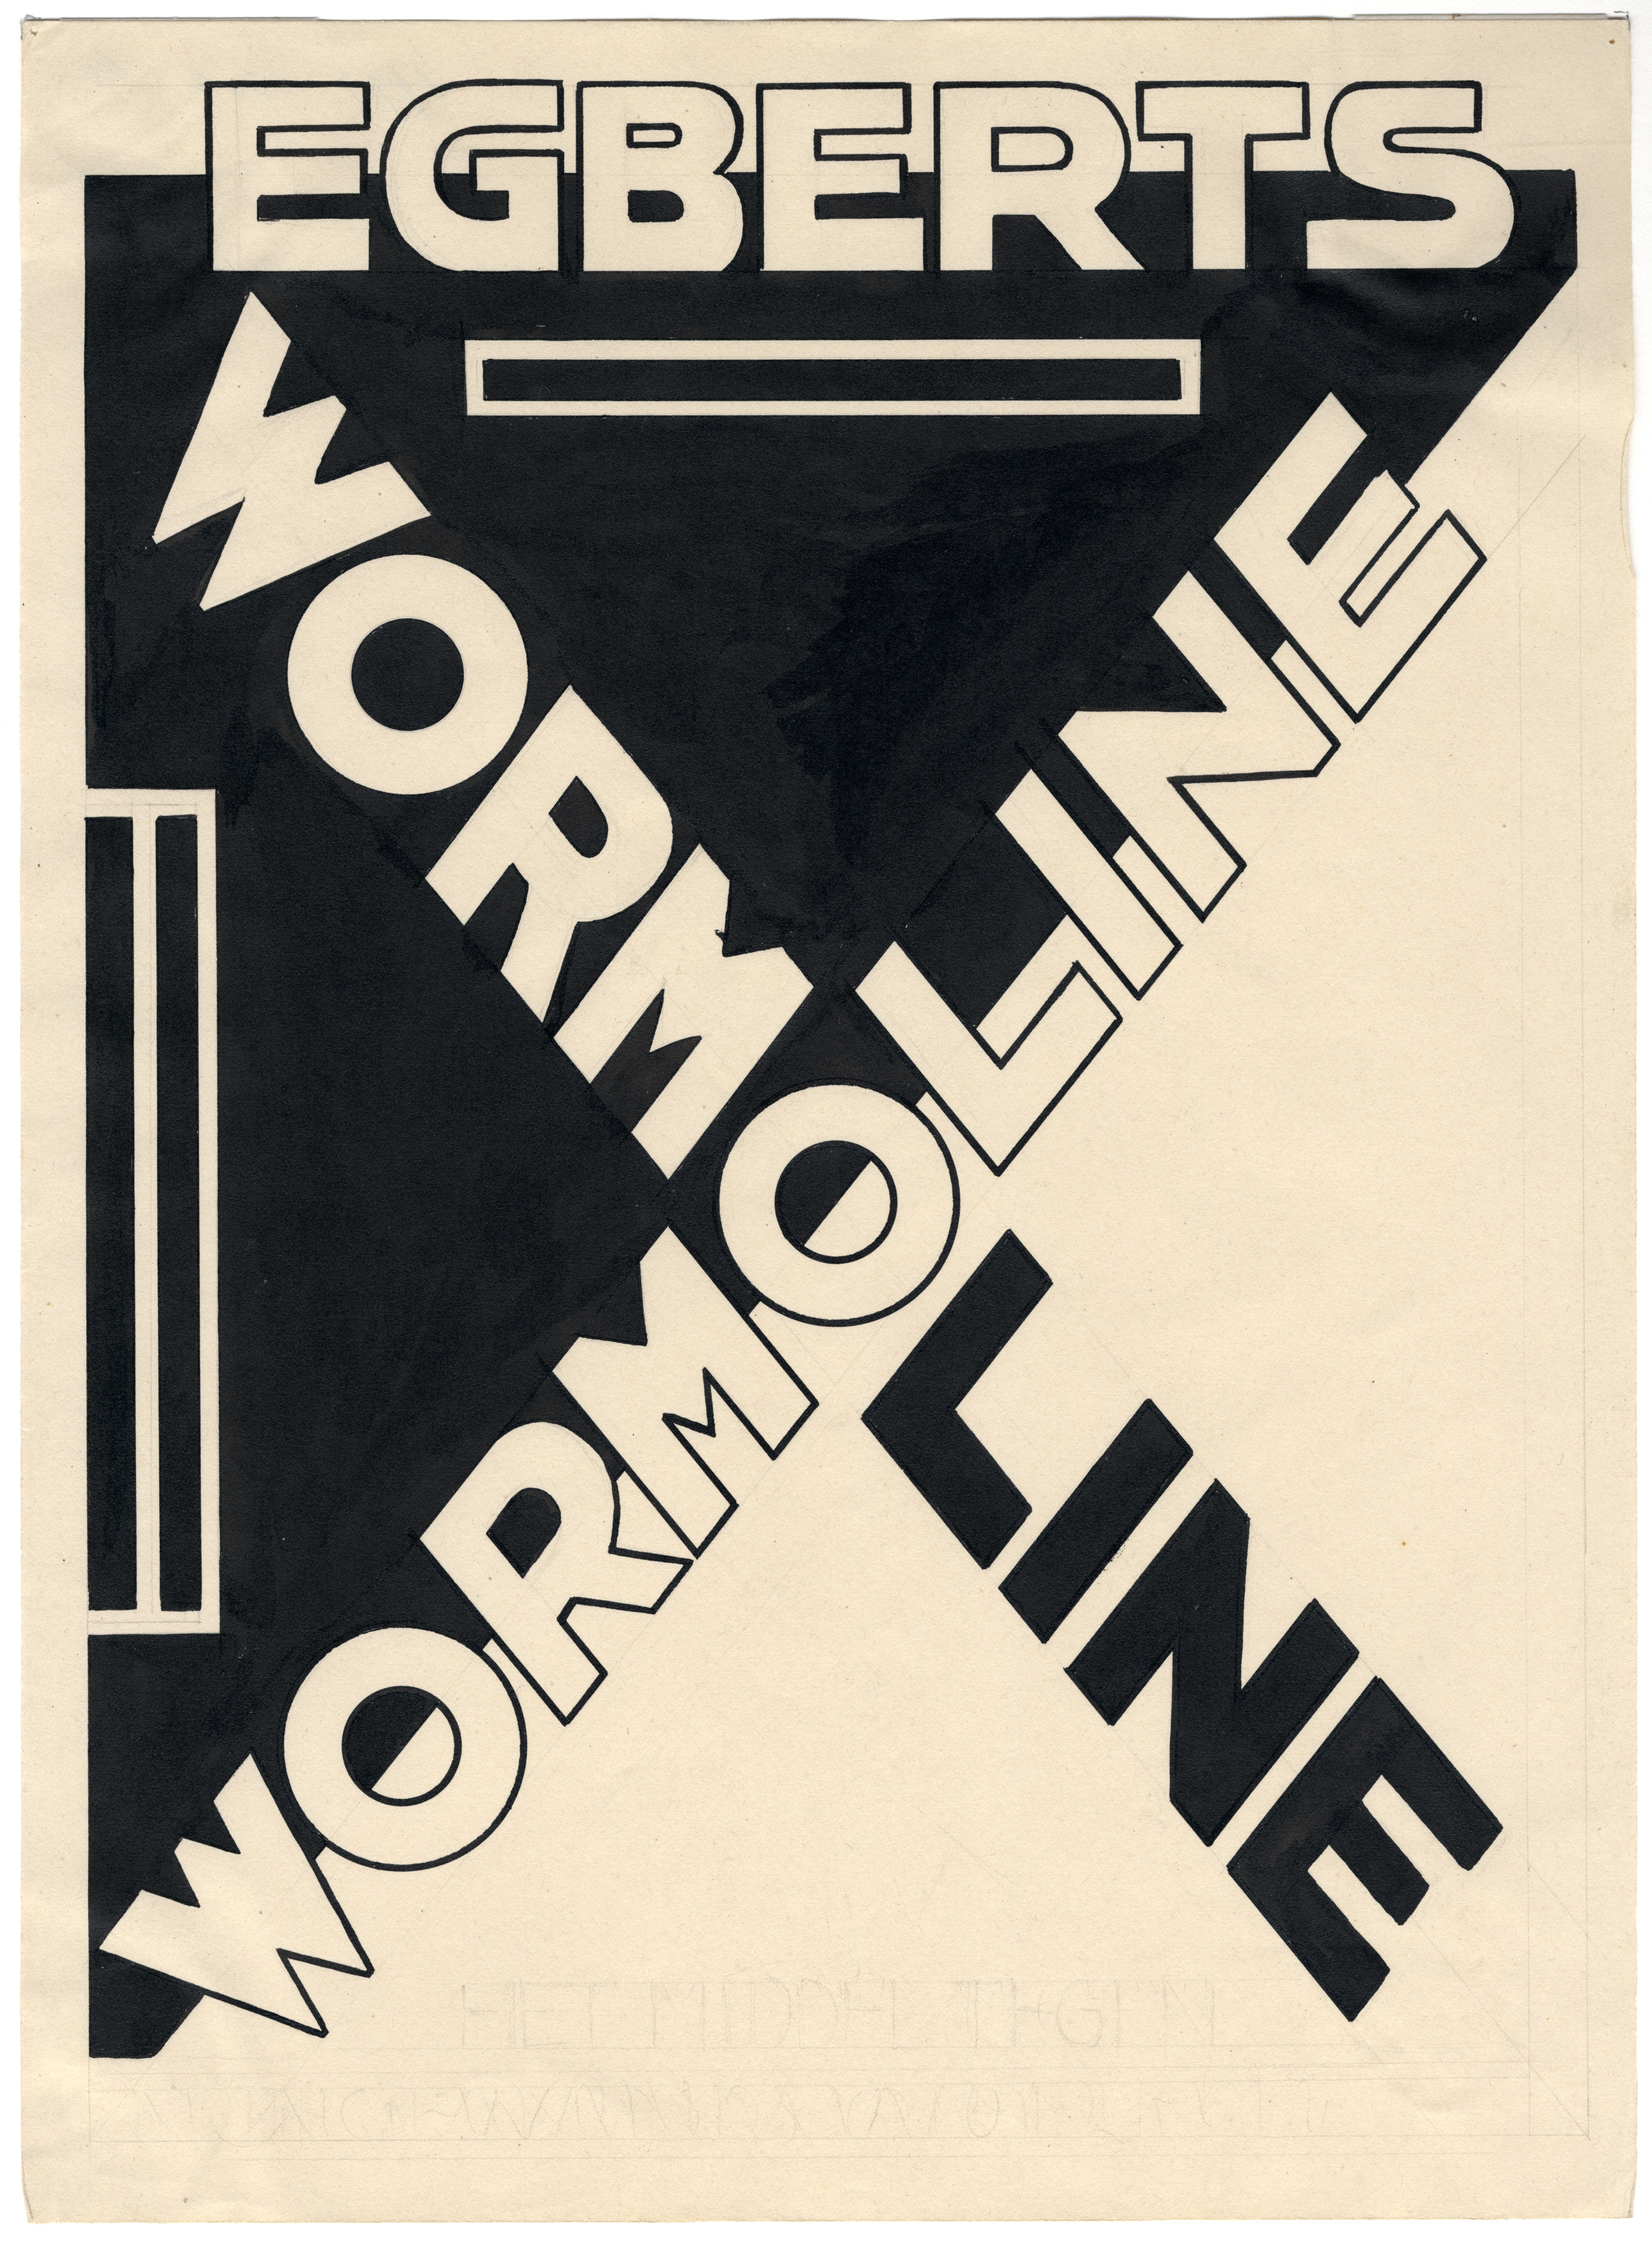 Wormoline